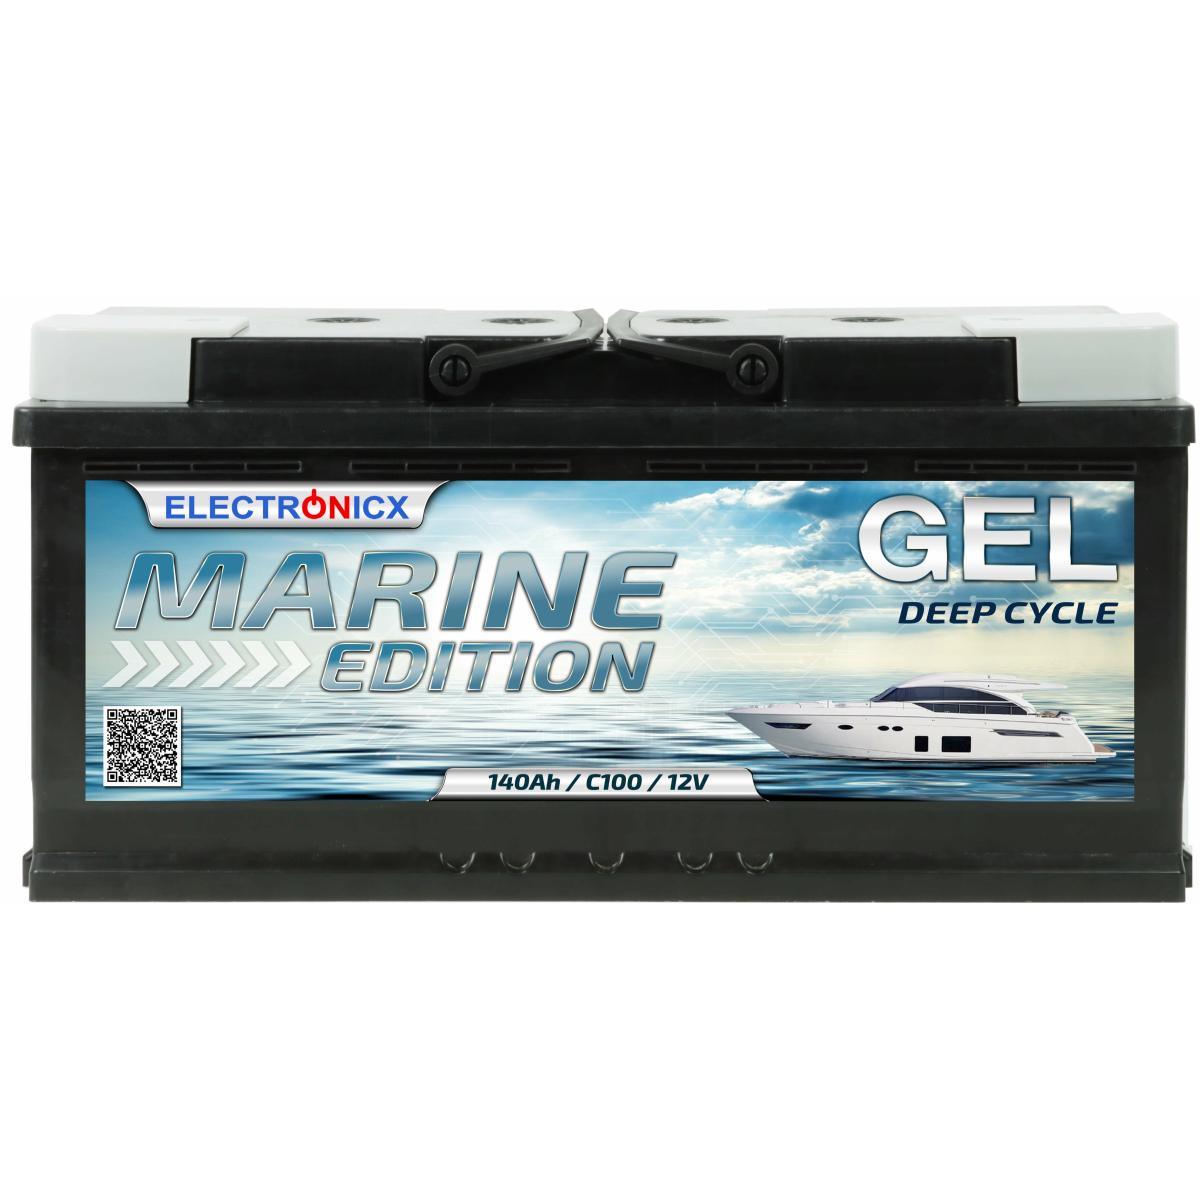 GEL Batterie 140AH Electronicx Marine Edition Boot Schiff Versorgungsbatterie 12V Akku Deep Bootsbatterie Autobatterie Solarbatterie Solar Batterien…